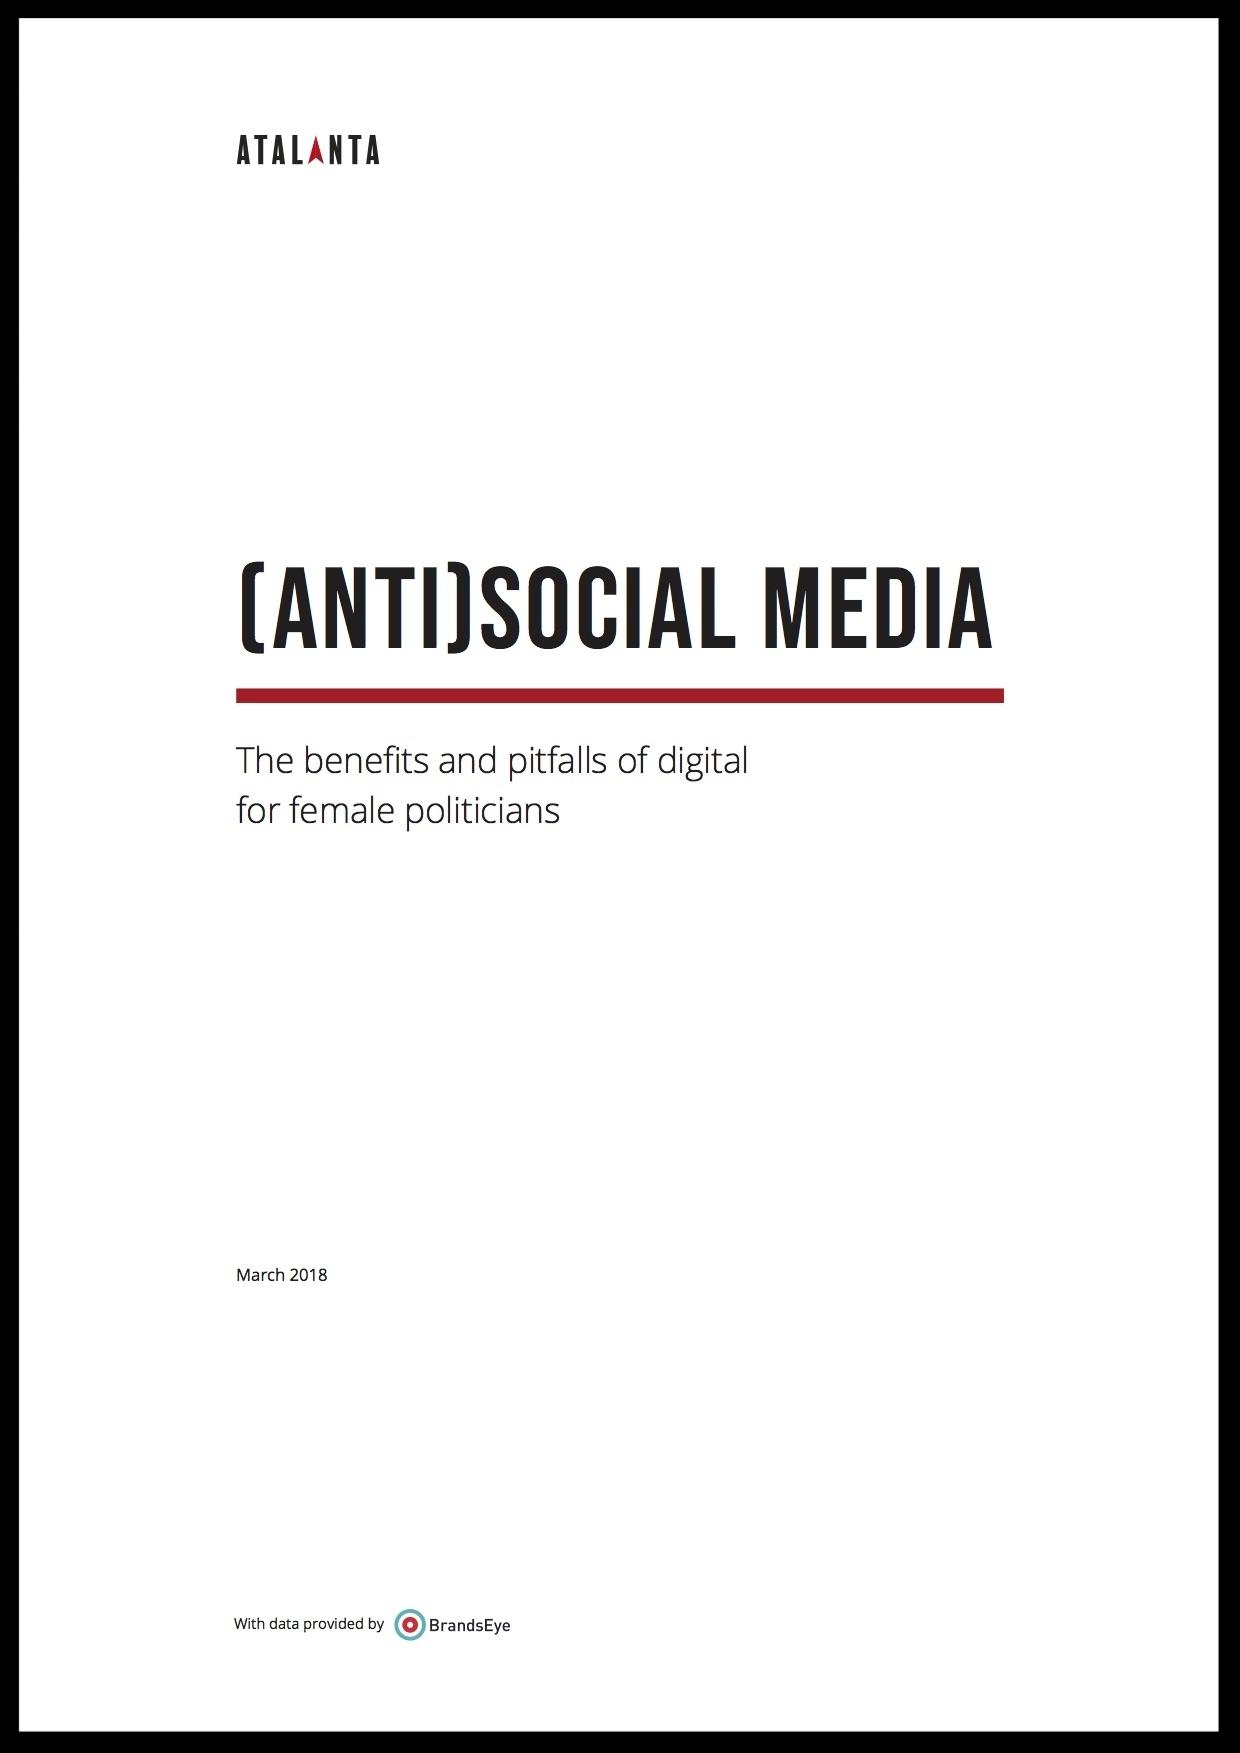 anti-social image.jpg